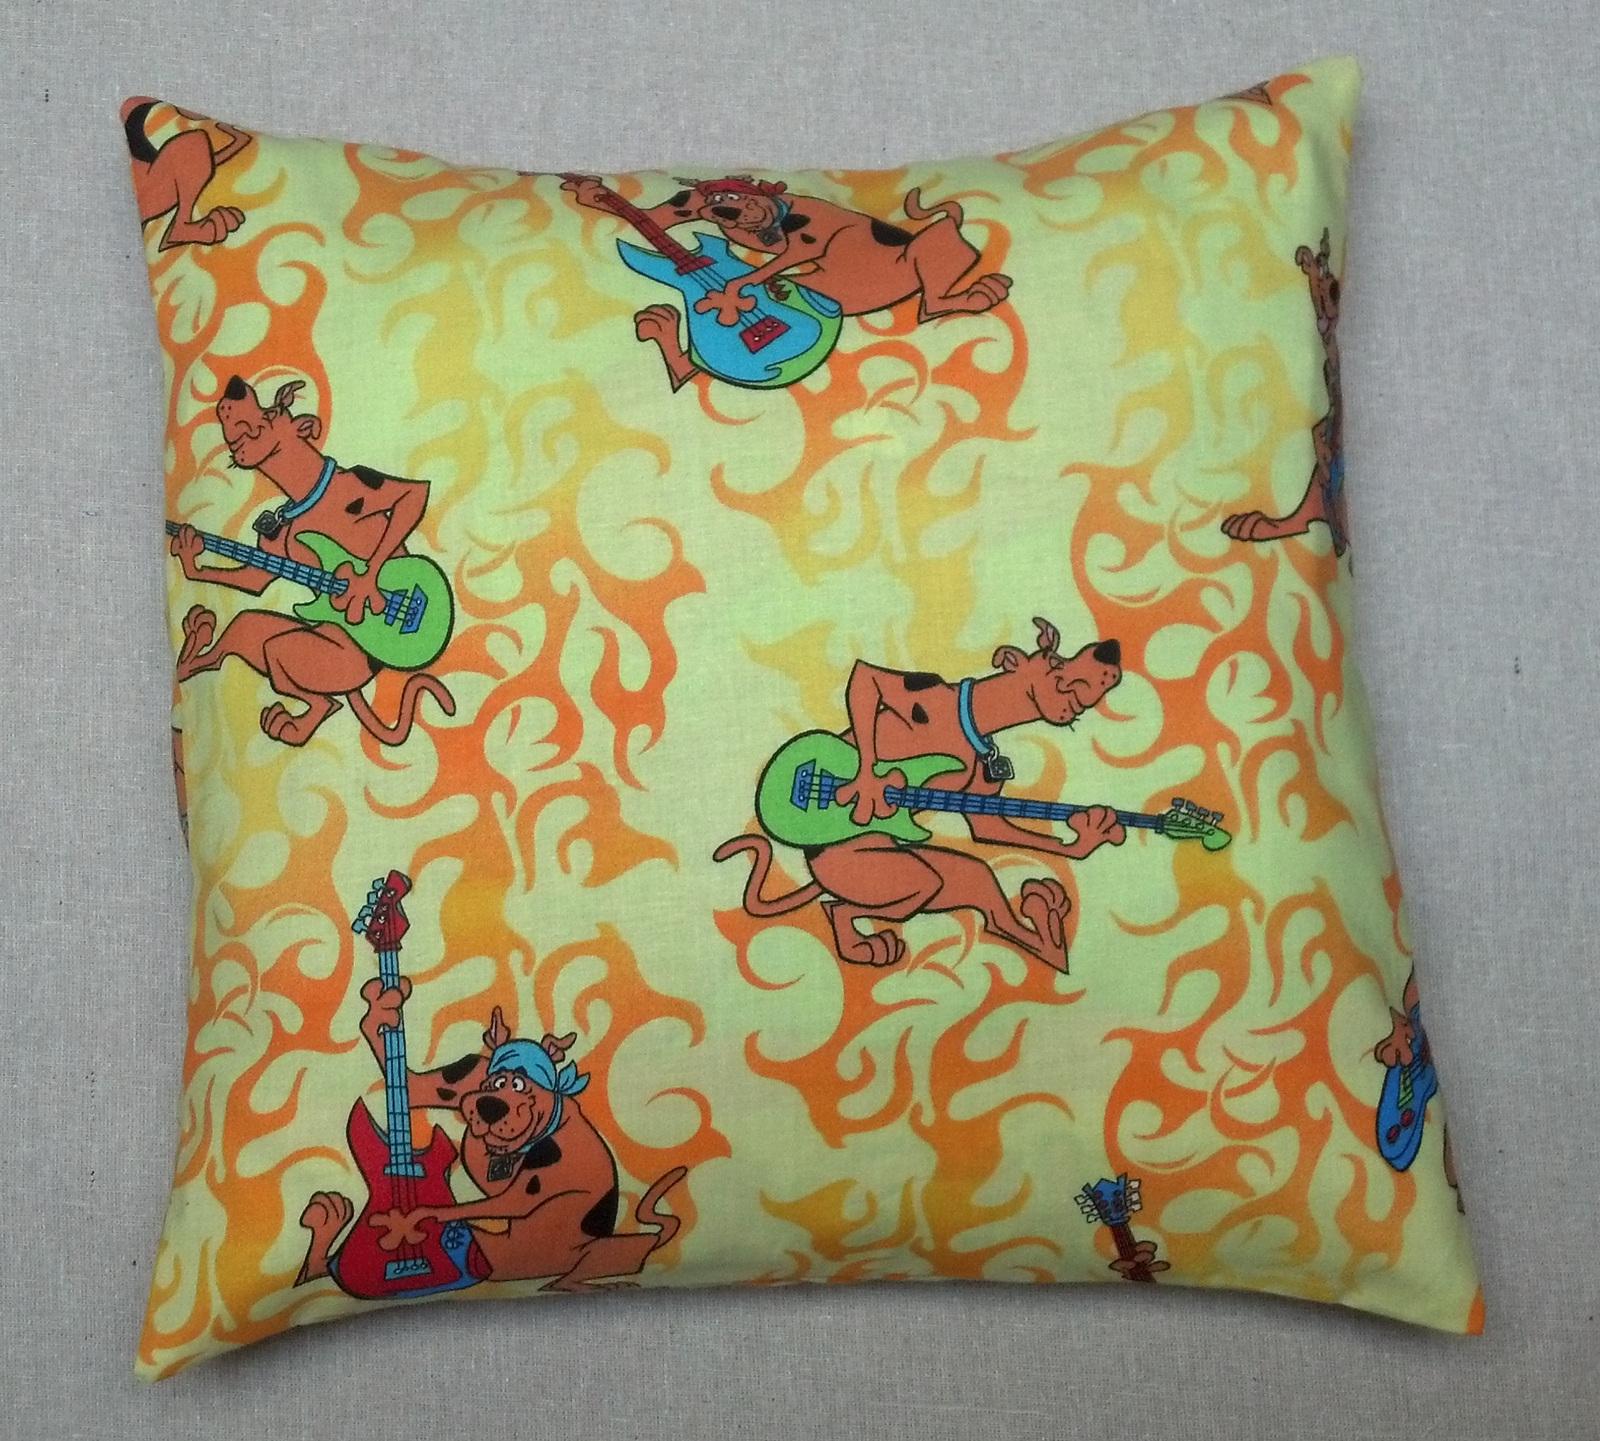 Handmade Scooby Doo Dog Animal Guitar Pillow Case Cover